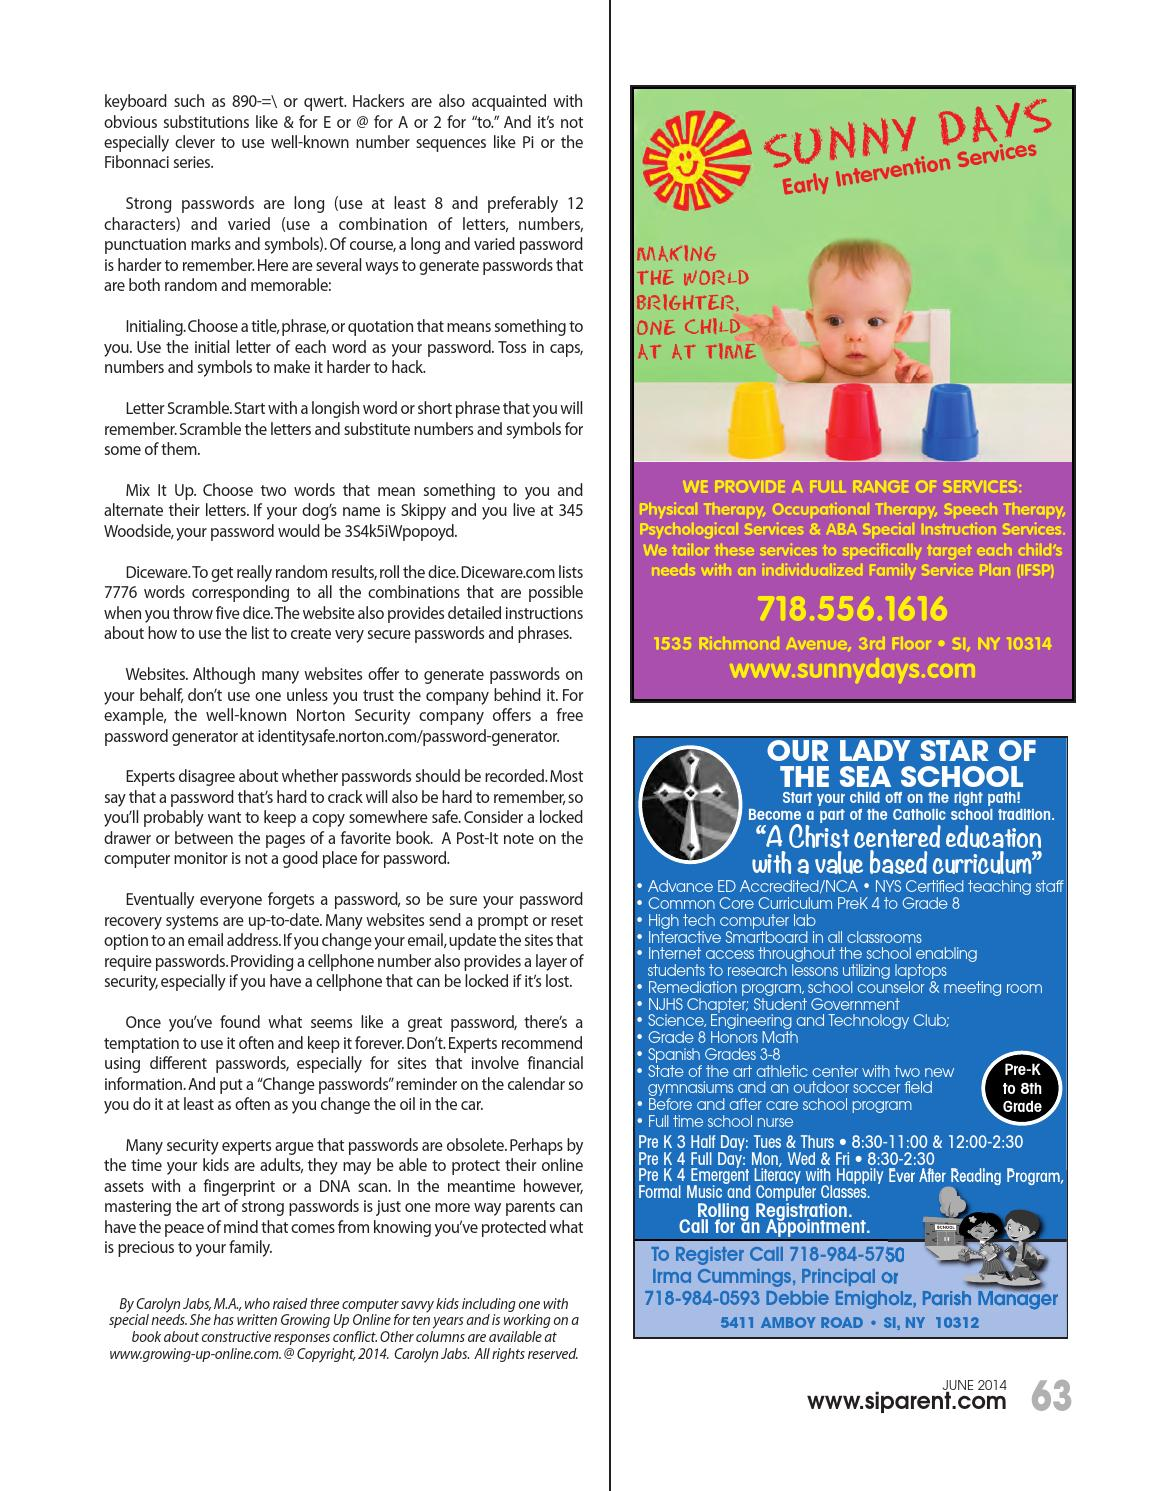 Staten island parent june 2014 by staten island parent issuu biocorpaavc Choice Image